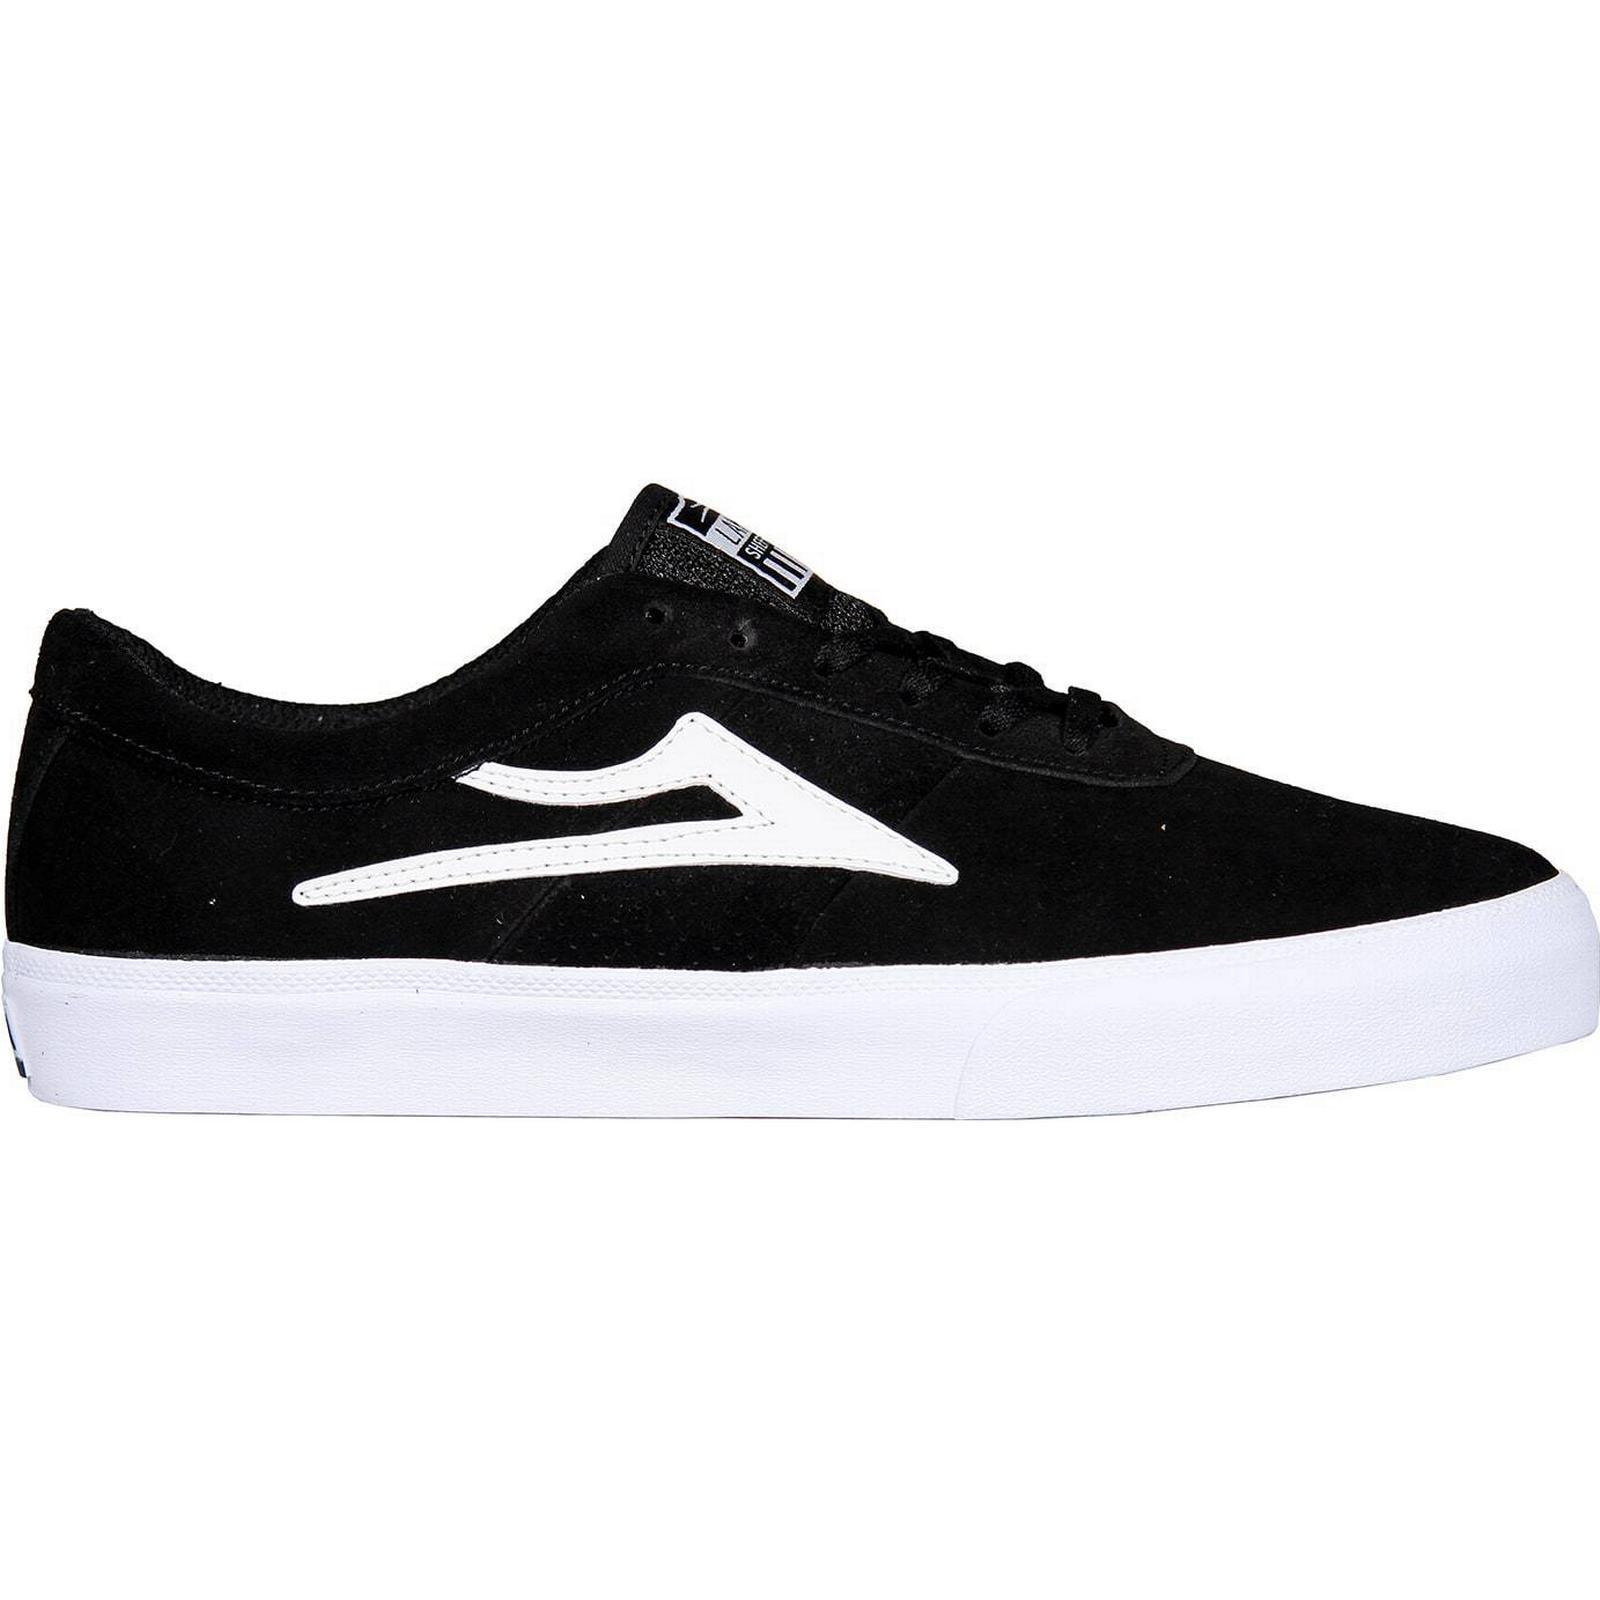 Lakai Black Sheffield Skate Shoes - Black Lakai Suede 18de2f